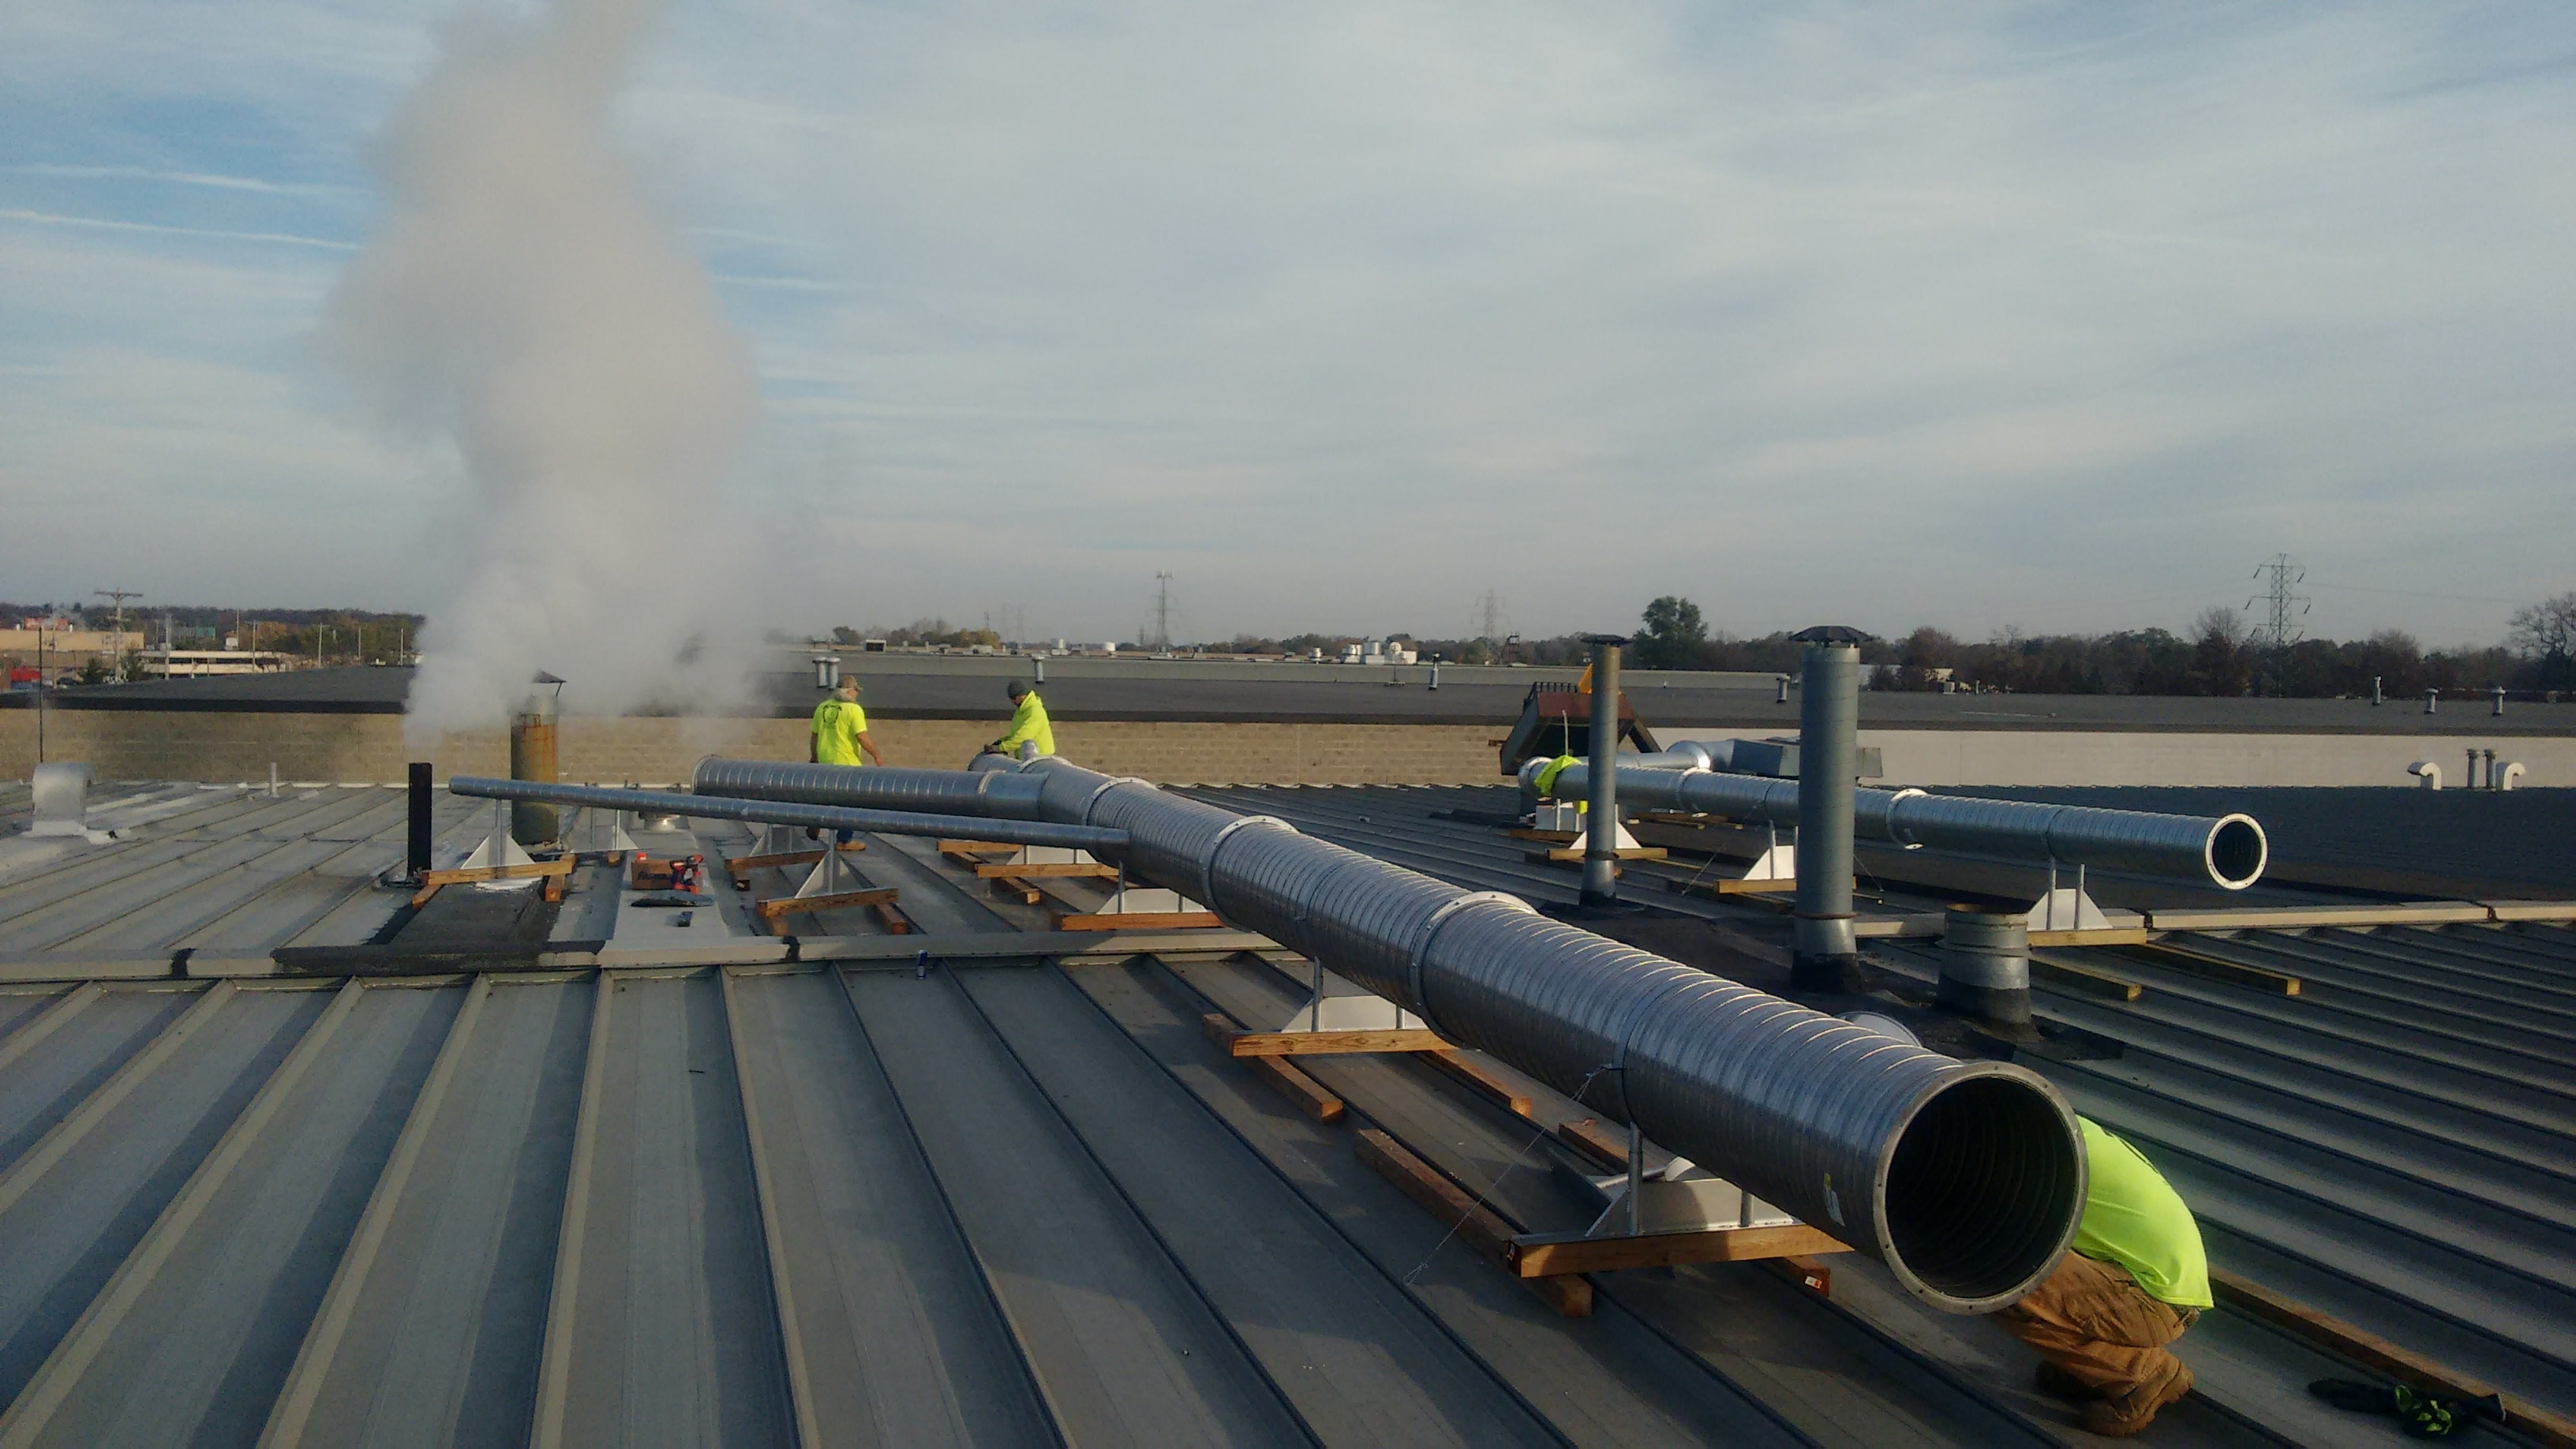 Duct Installation 10,000 SCFM Regenerative Thermal Oxidizer